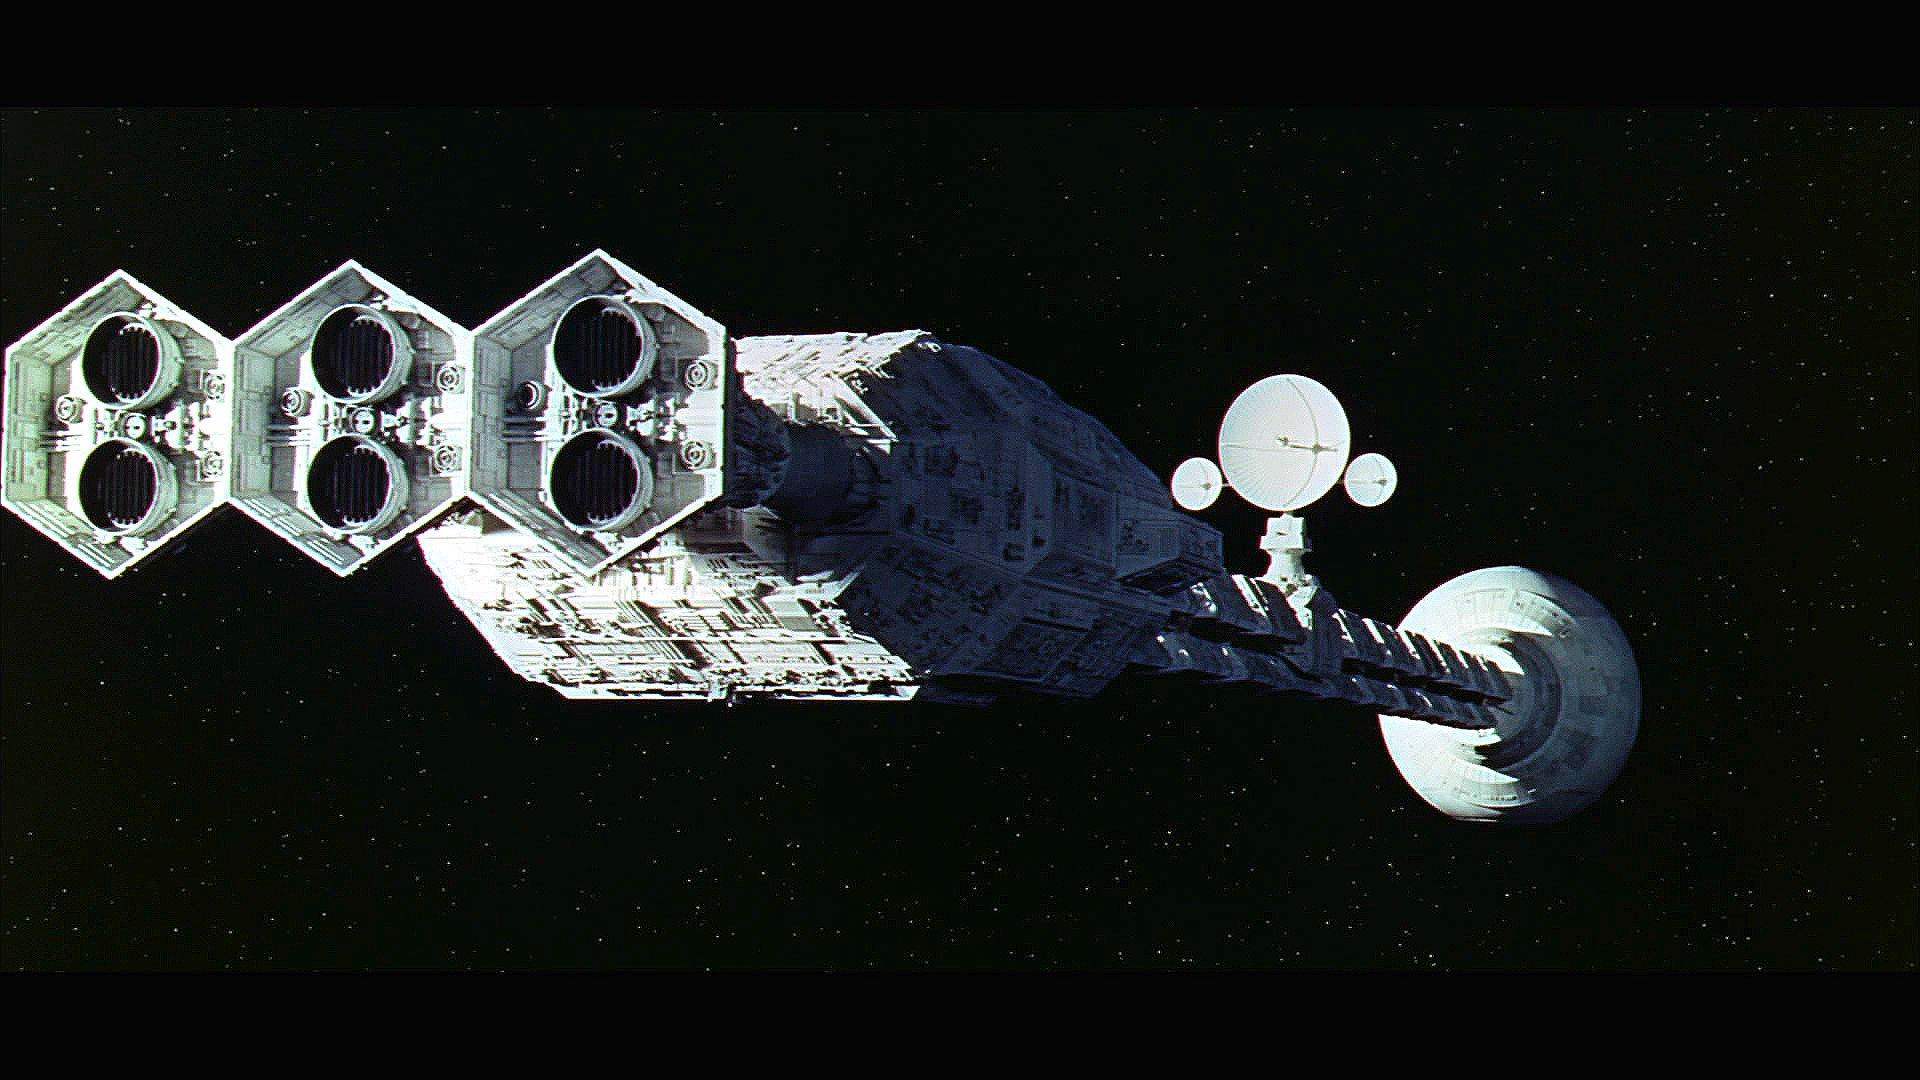 Space Odyssey Spacecraft 2001 Space Odyssey Sci-fi